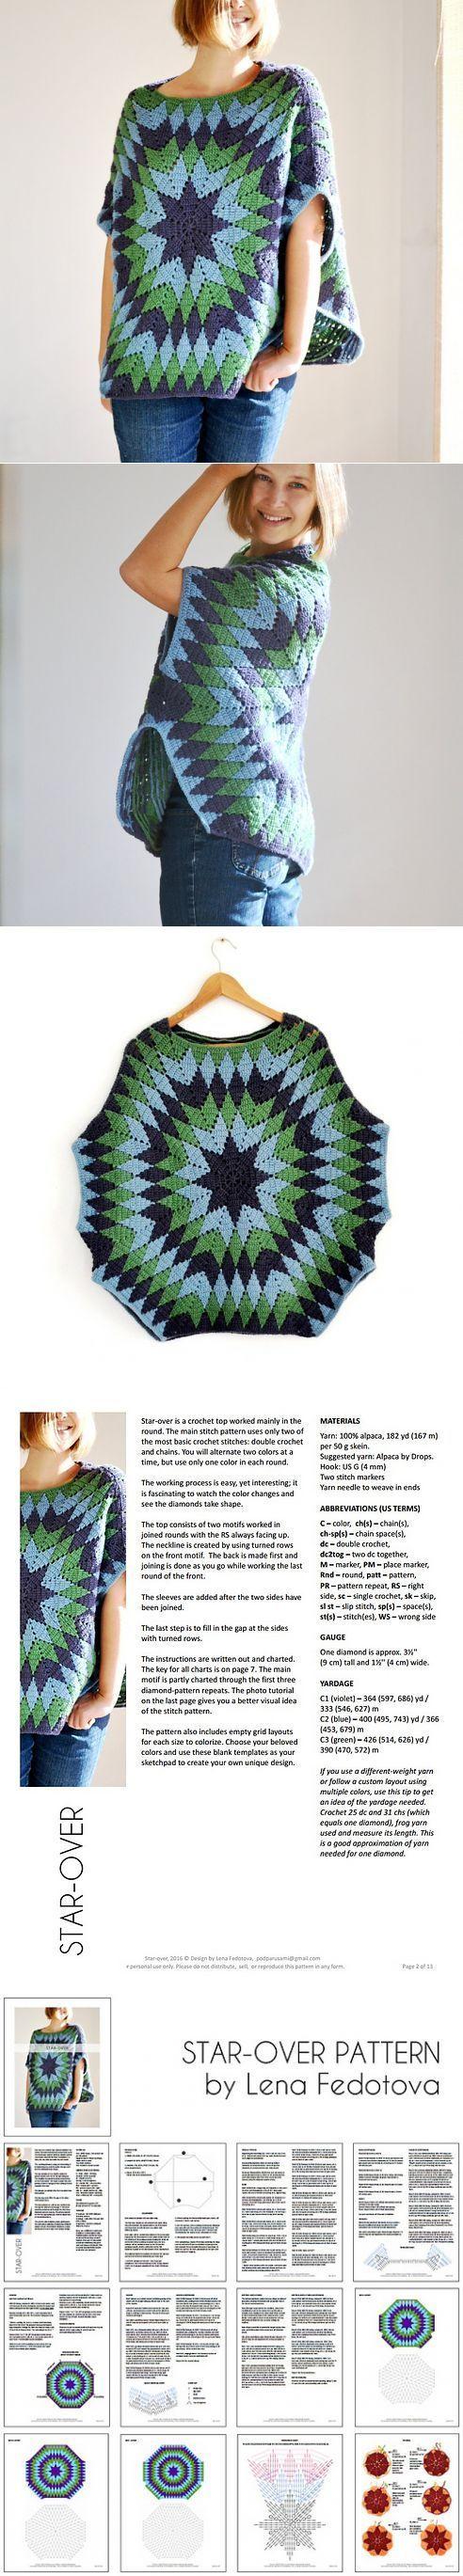 Crochet Start-над пончо